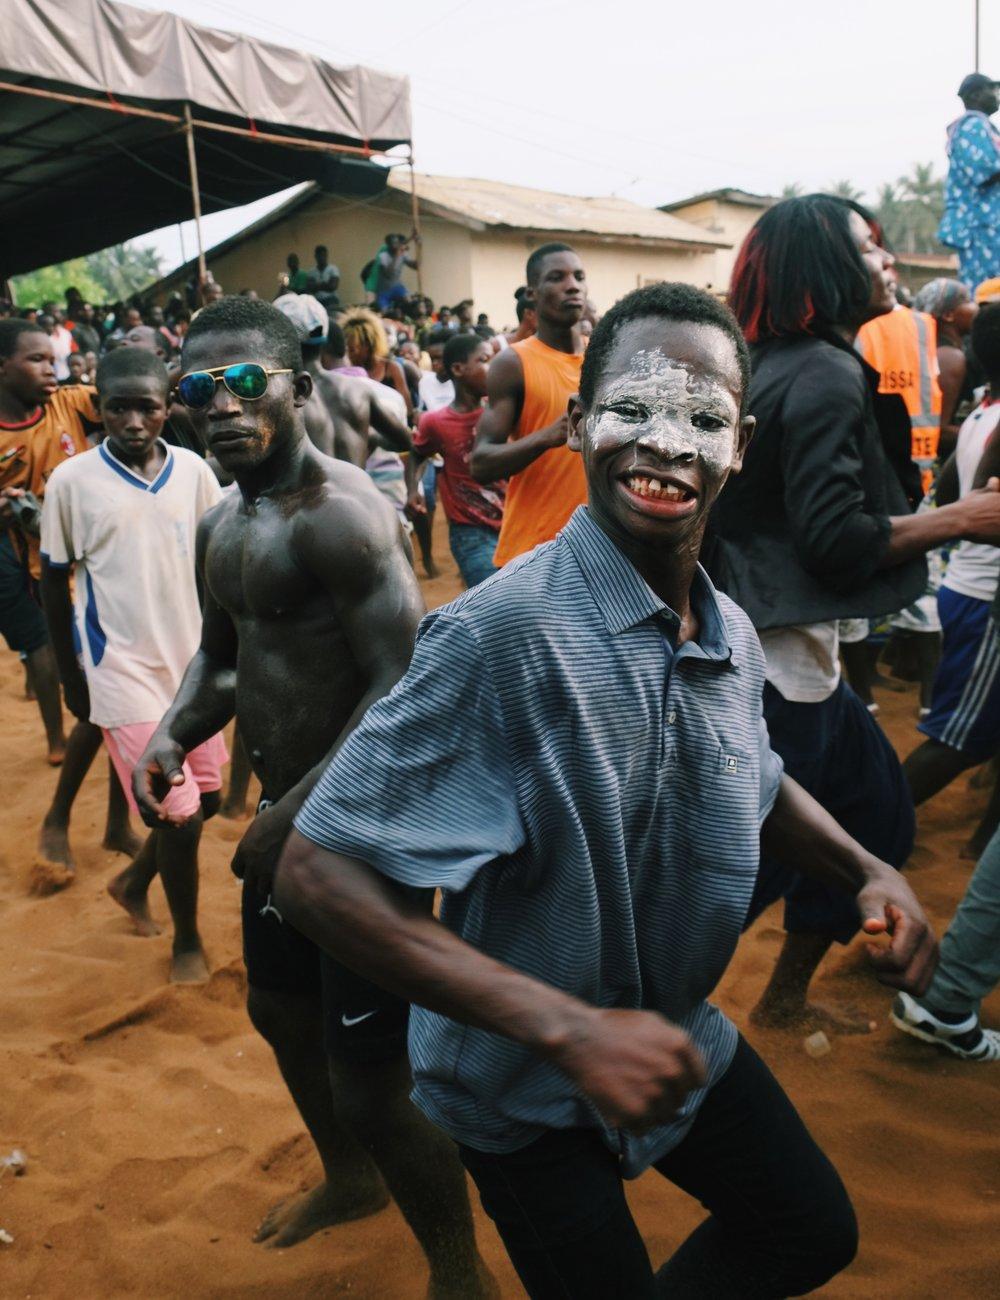 Abissa Festival Frand Bassam Ivory Coast Joost Bastmeijer.jpeg